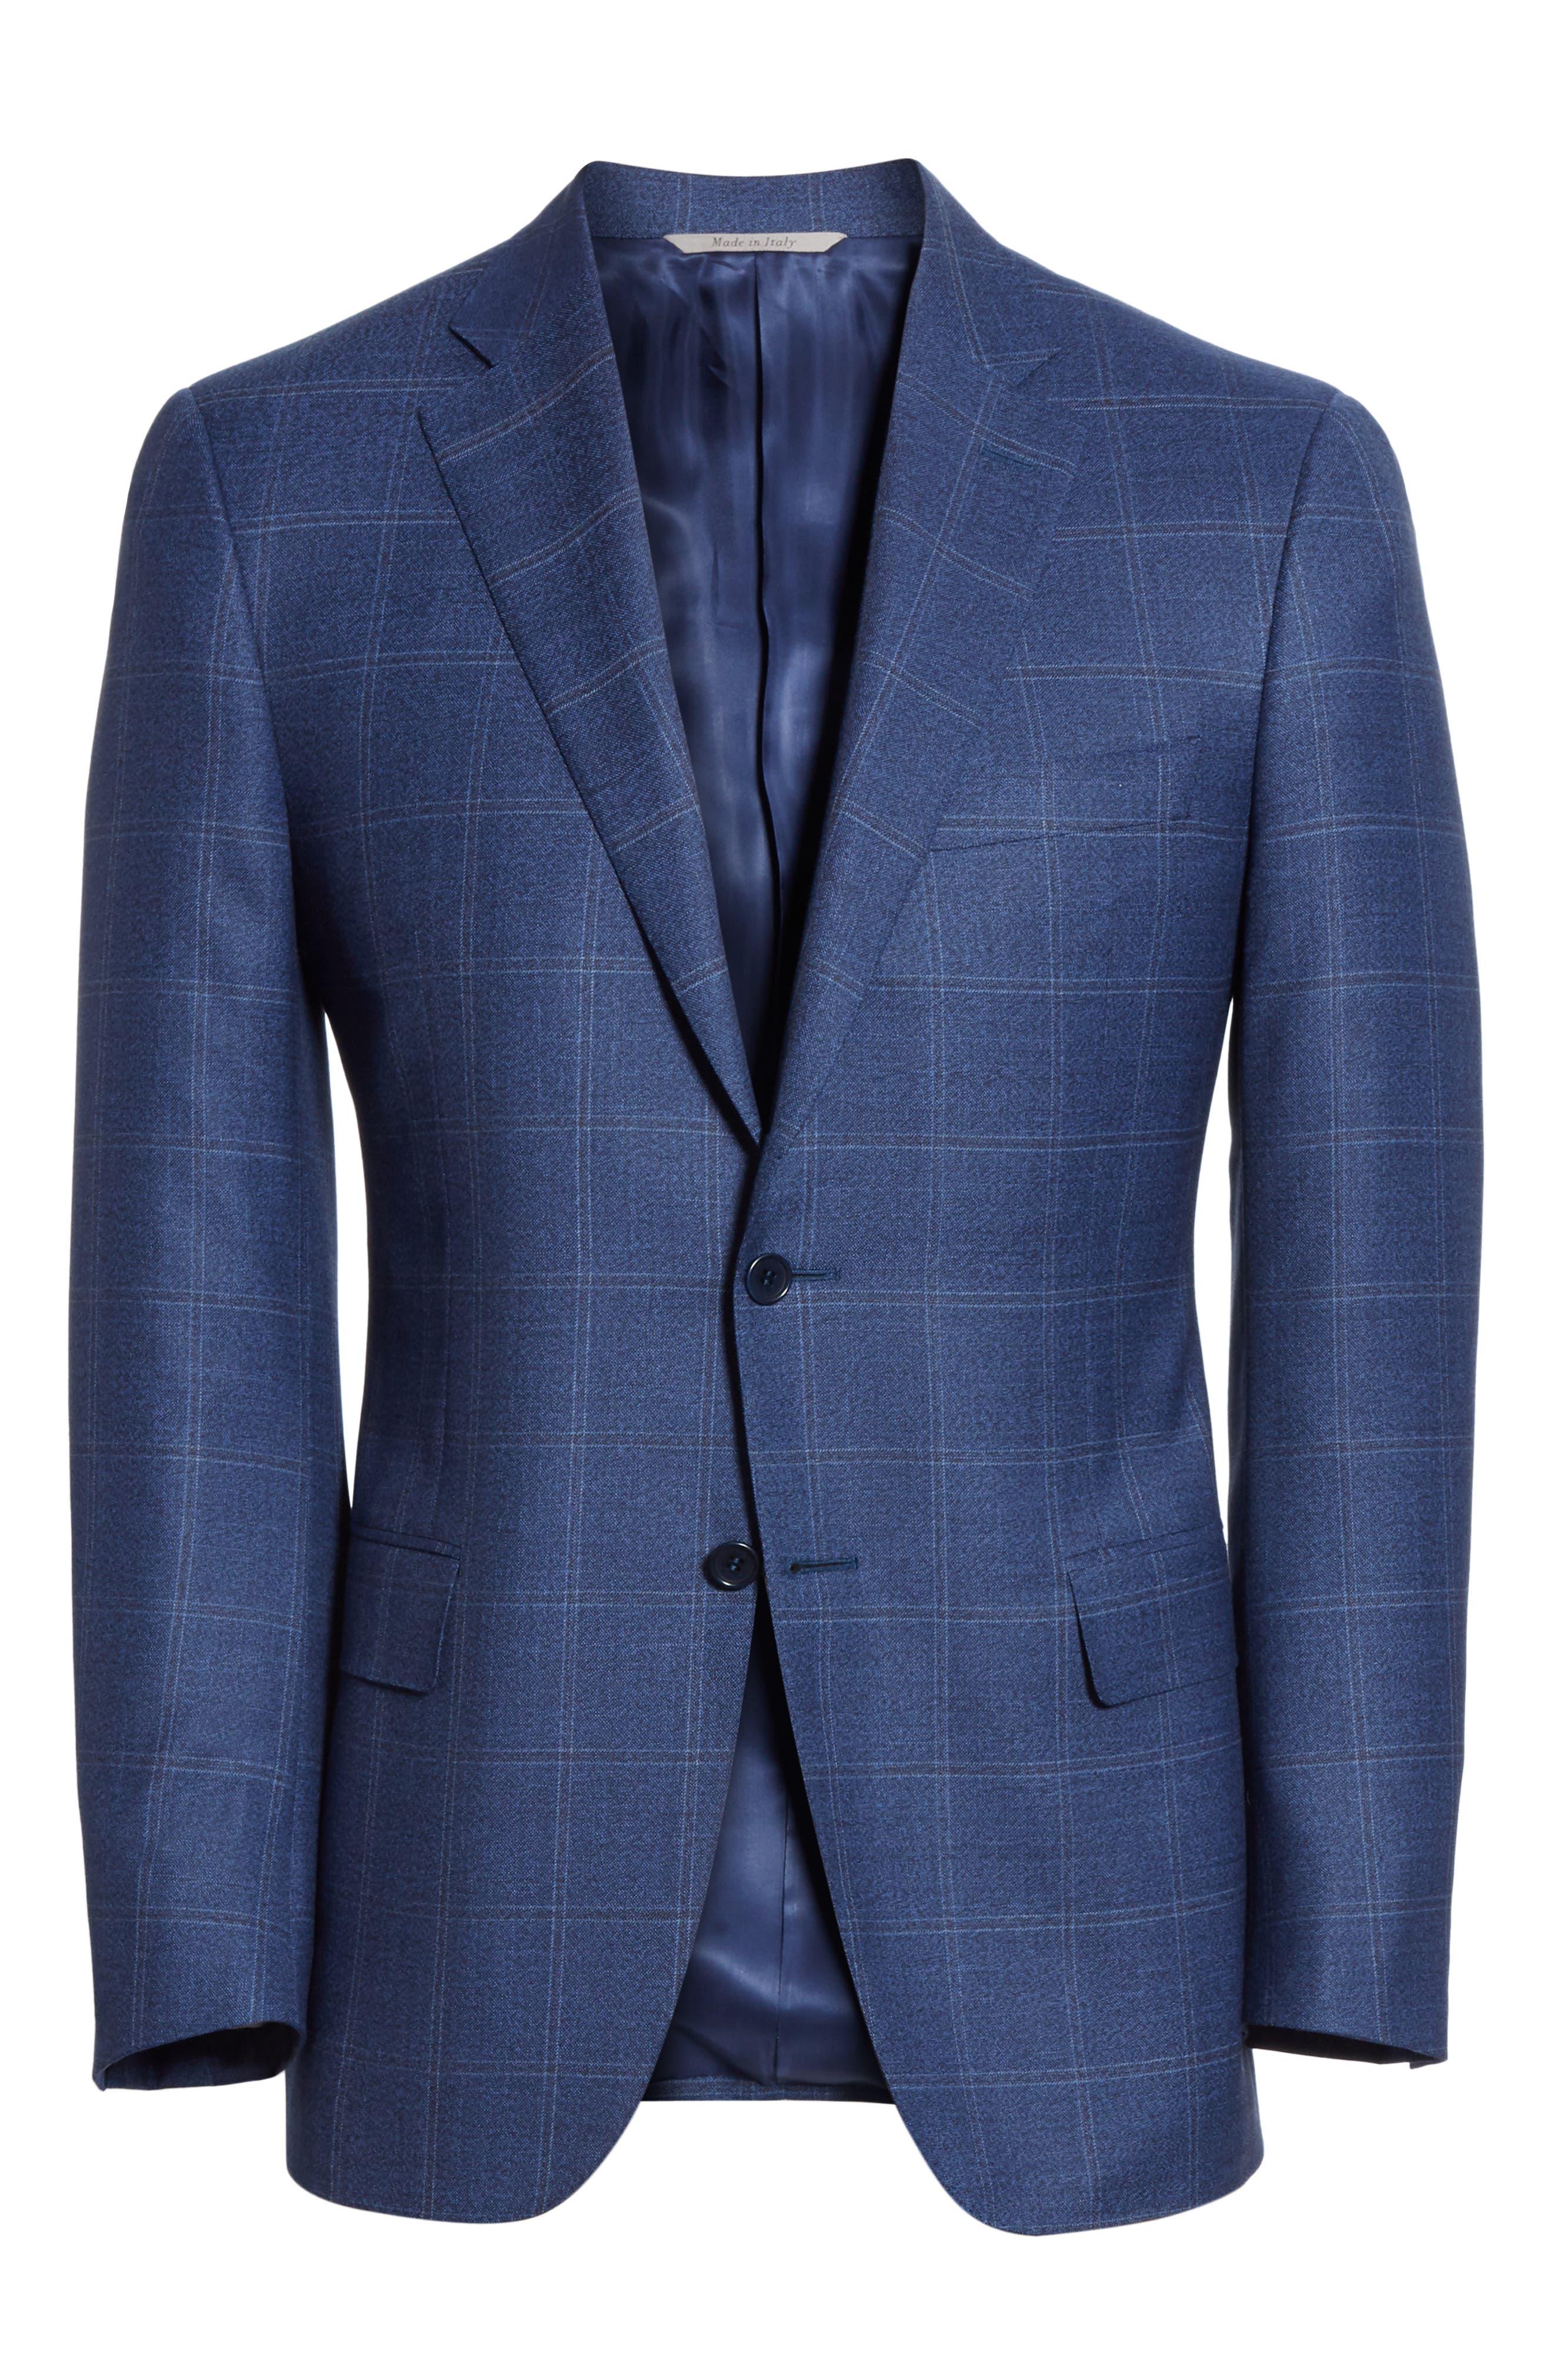 CANALI, Siena Classic Fit Plaid Wool Sport Coat, Alternate thumbnail 5, color, BLUE